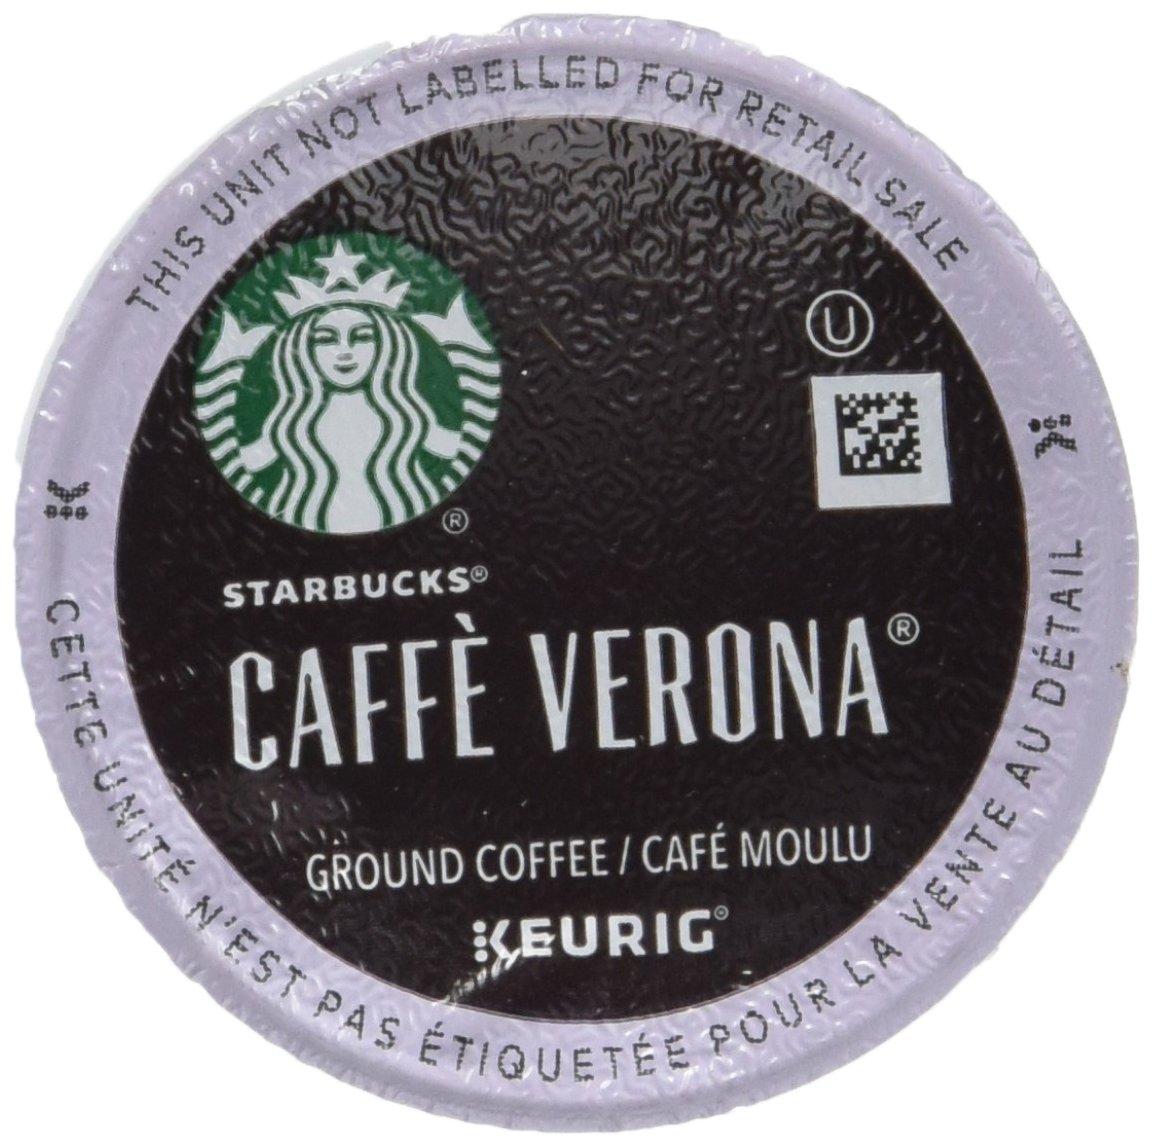 STARBUCKS CAFE VERONA BLEND 96 K CUPS by Starbucks